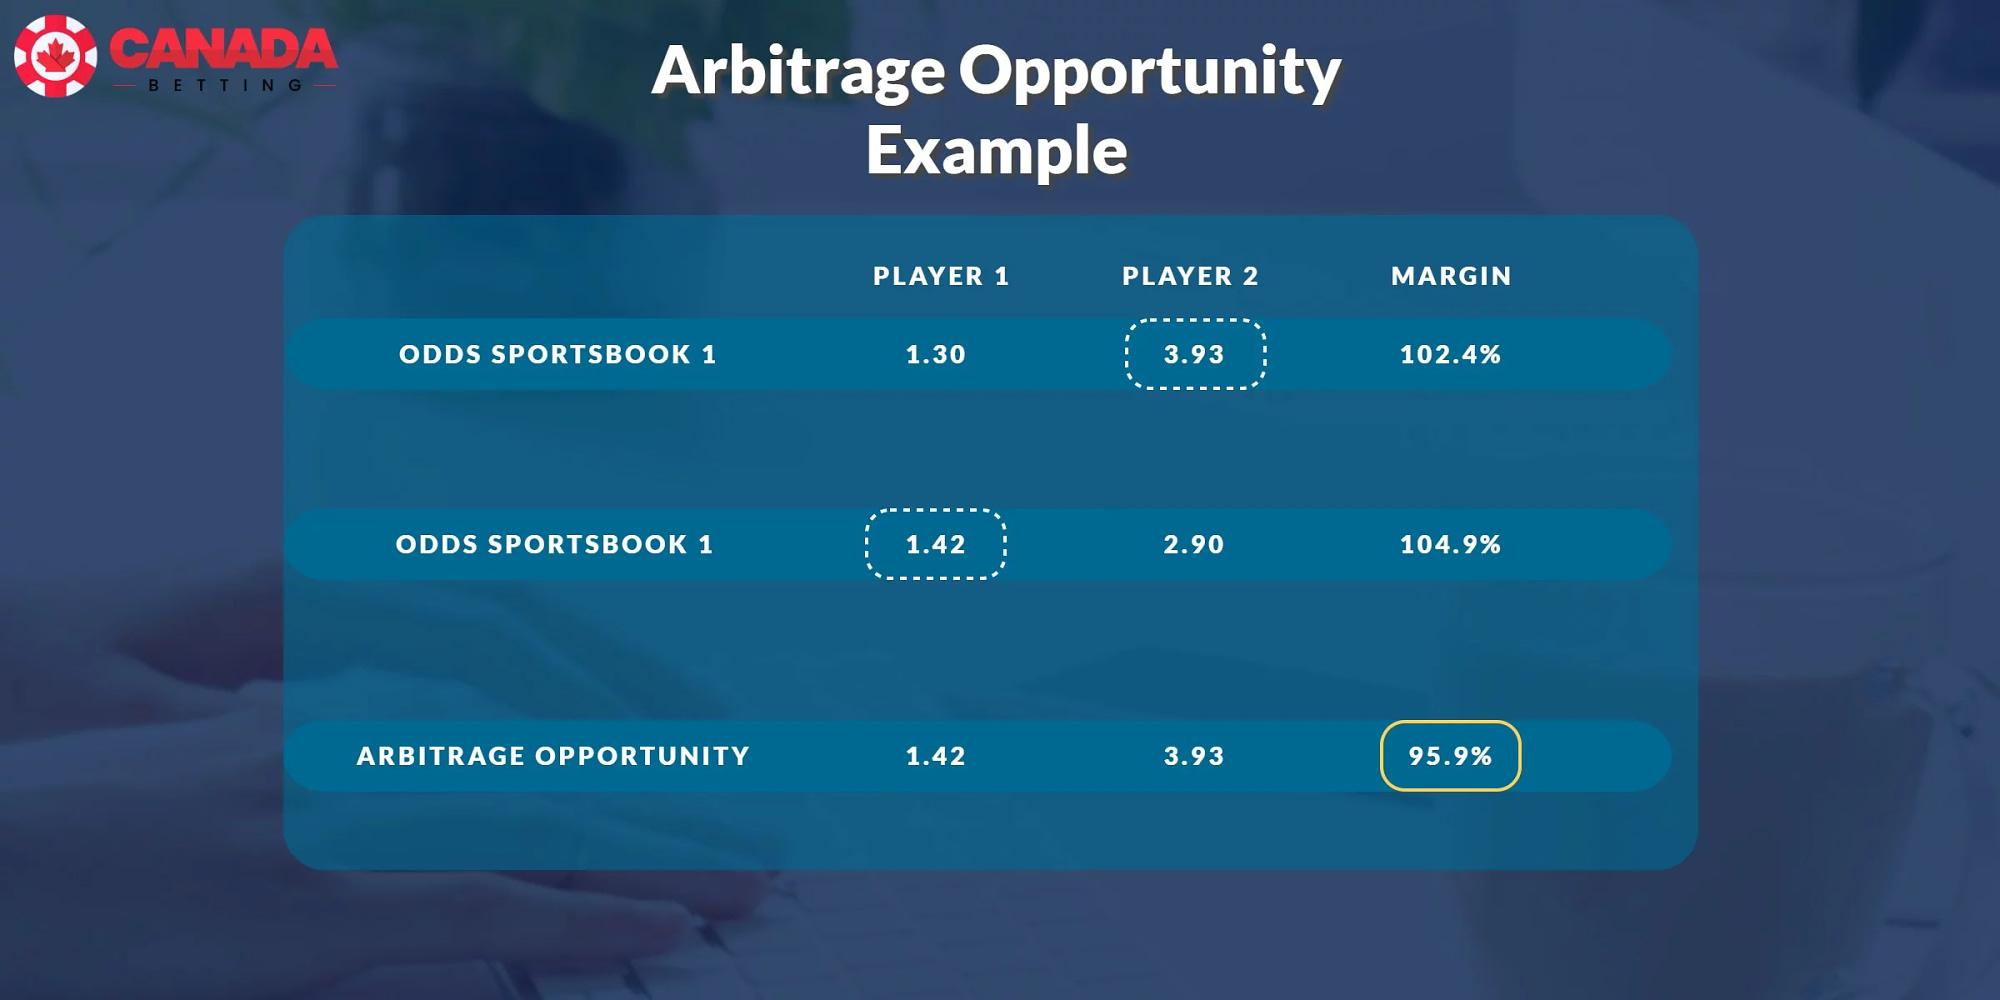 Arbitrage opportunity example